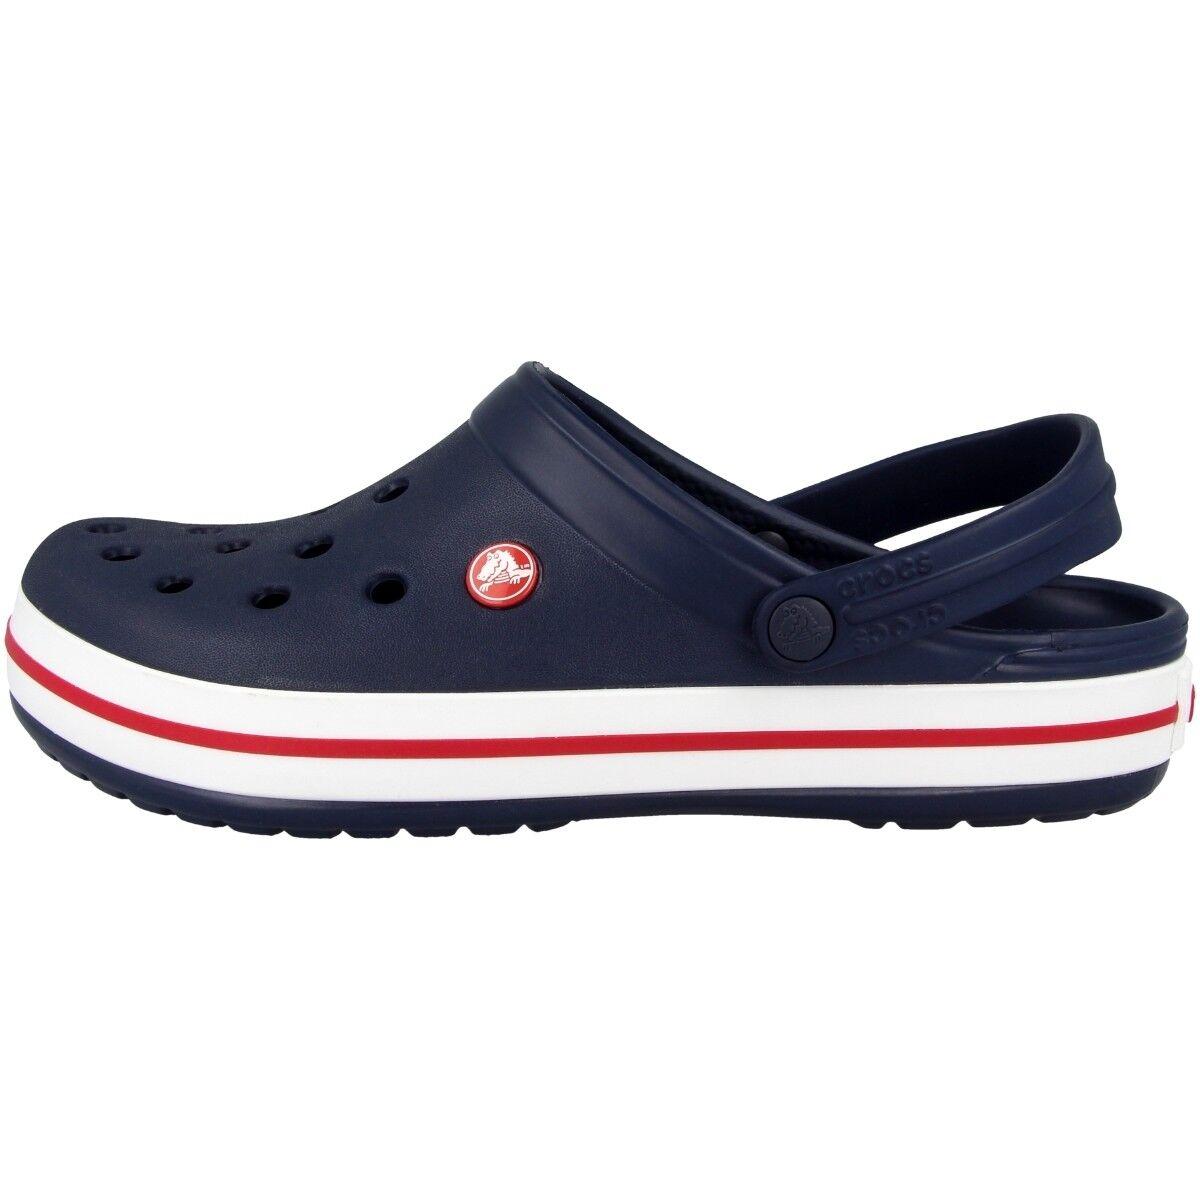 Crocs Crocband Clog Sandale navy 11016-410 Clogs Schuhe Badeschuhe 2.5 Classic